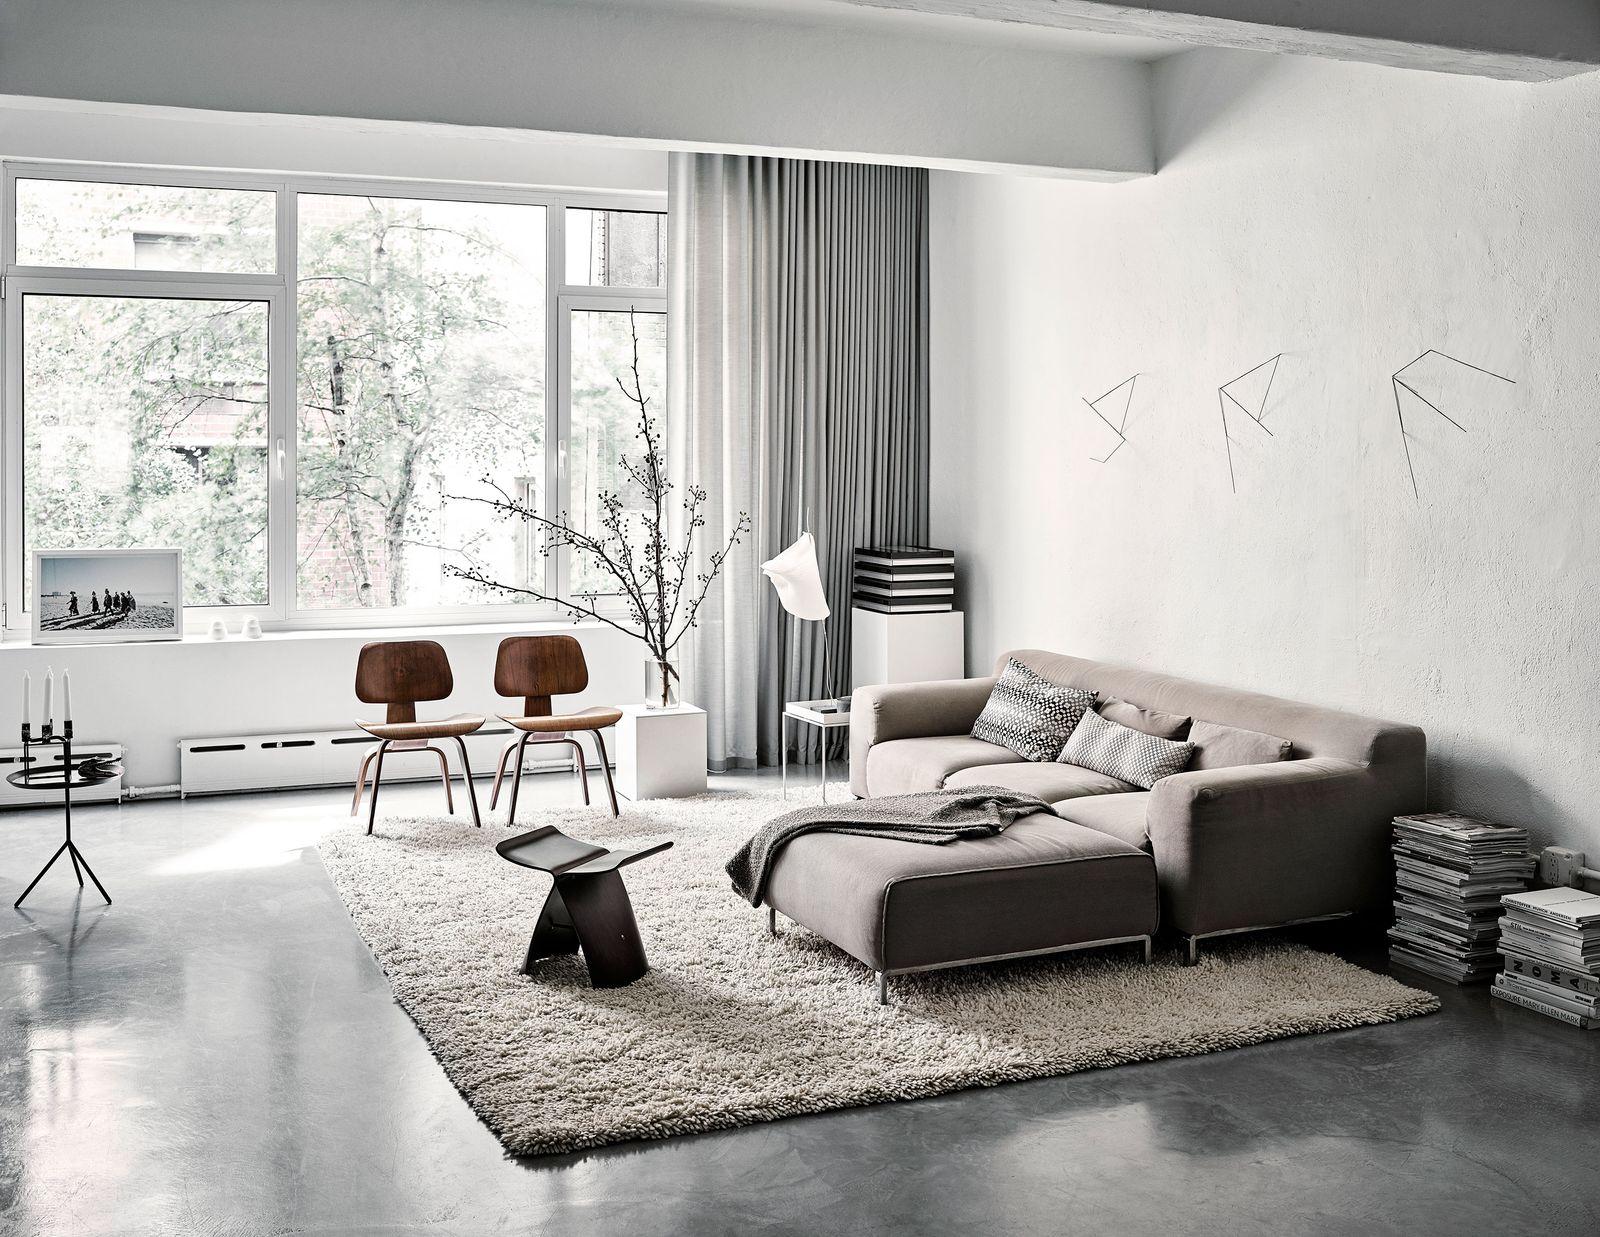 Tour the Showroom-Home of Danish Brand Vipp